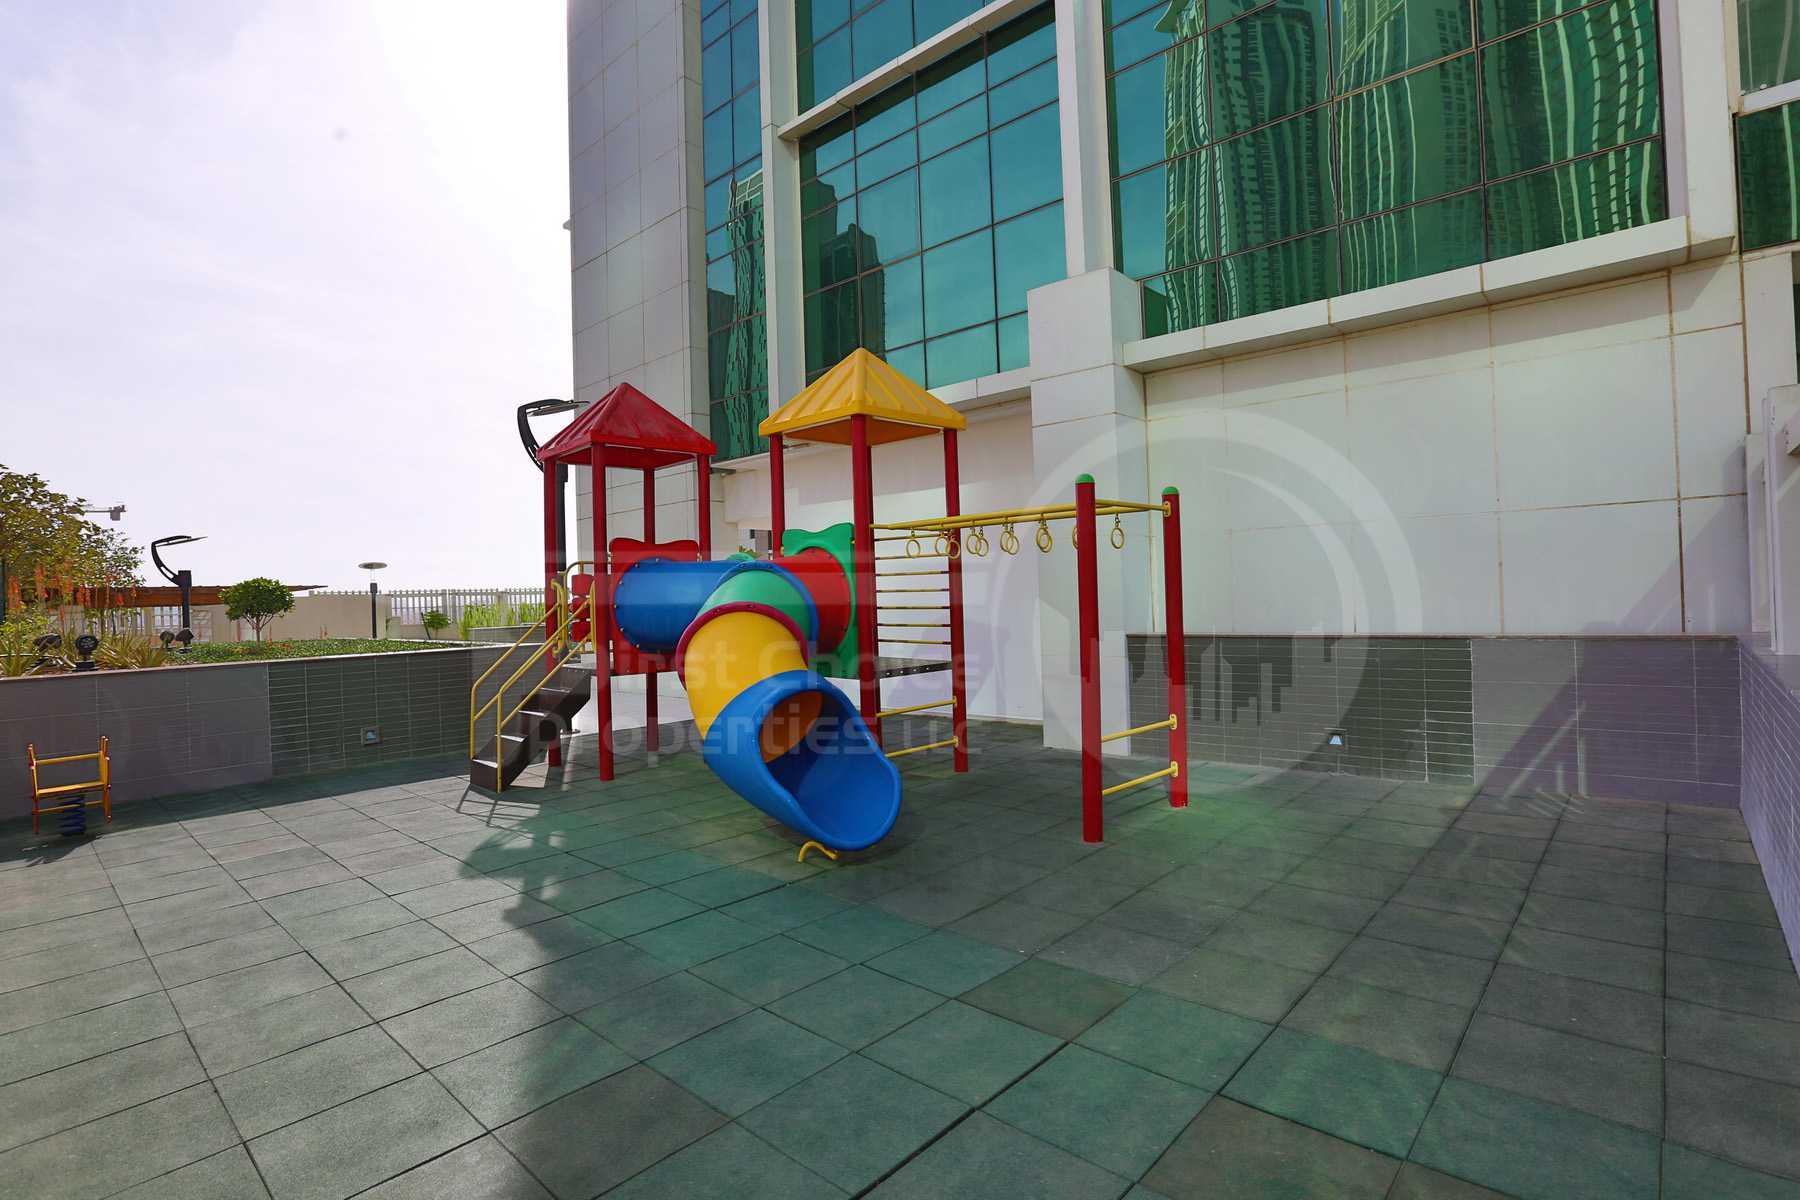 Studio - 1BR - 2BR - 3BR - 4BR Apartment - Abu Dhabi - UAE - Al Reem Island - Tala Tower - Outside View (12).jpg